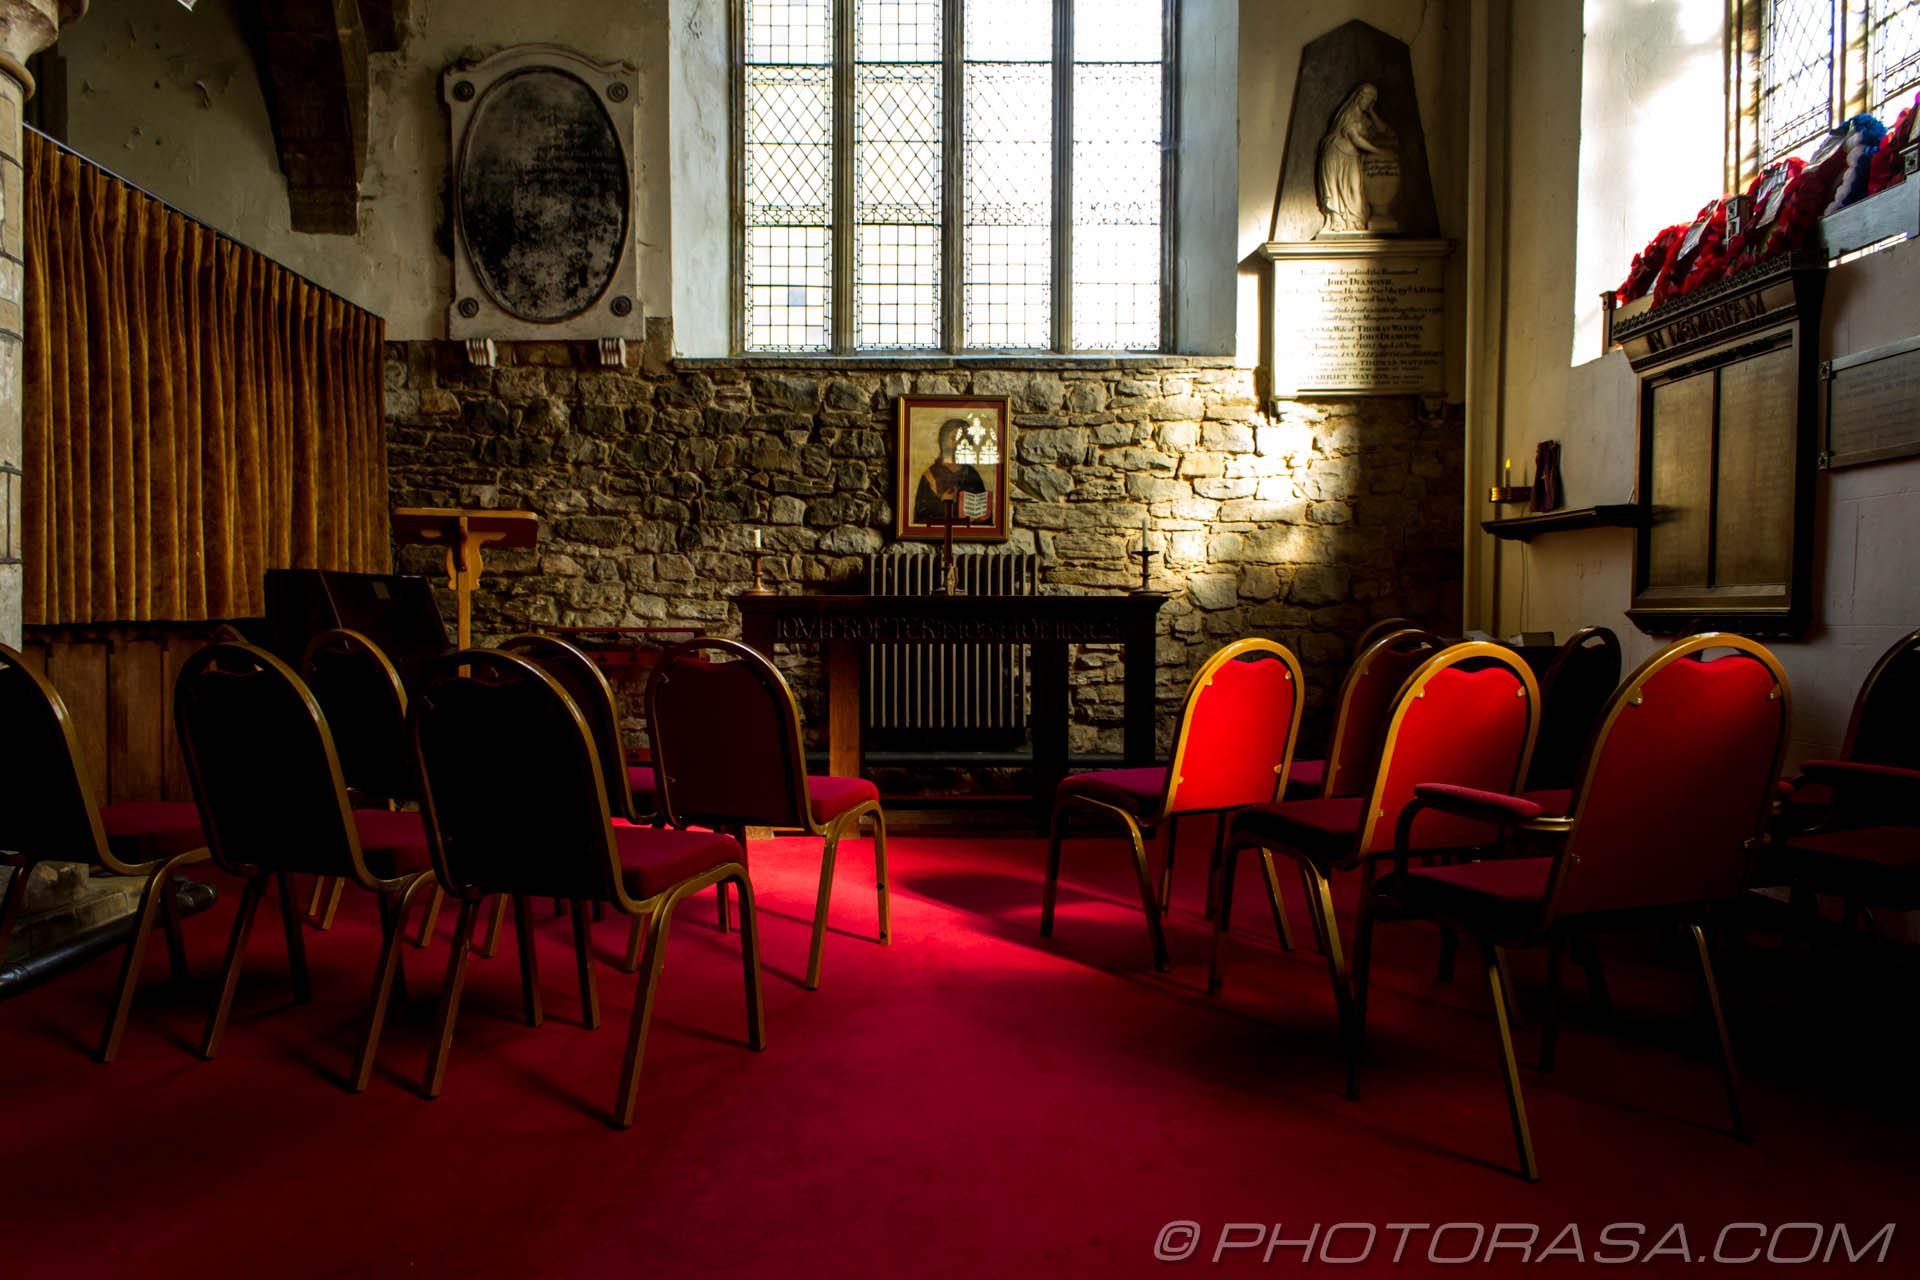 https://photorasa.com/saints-church-staplehurst-kent/meeting-area-for-group-prayer/